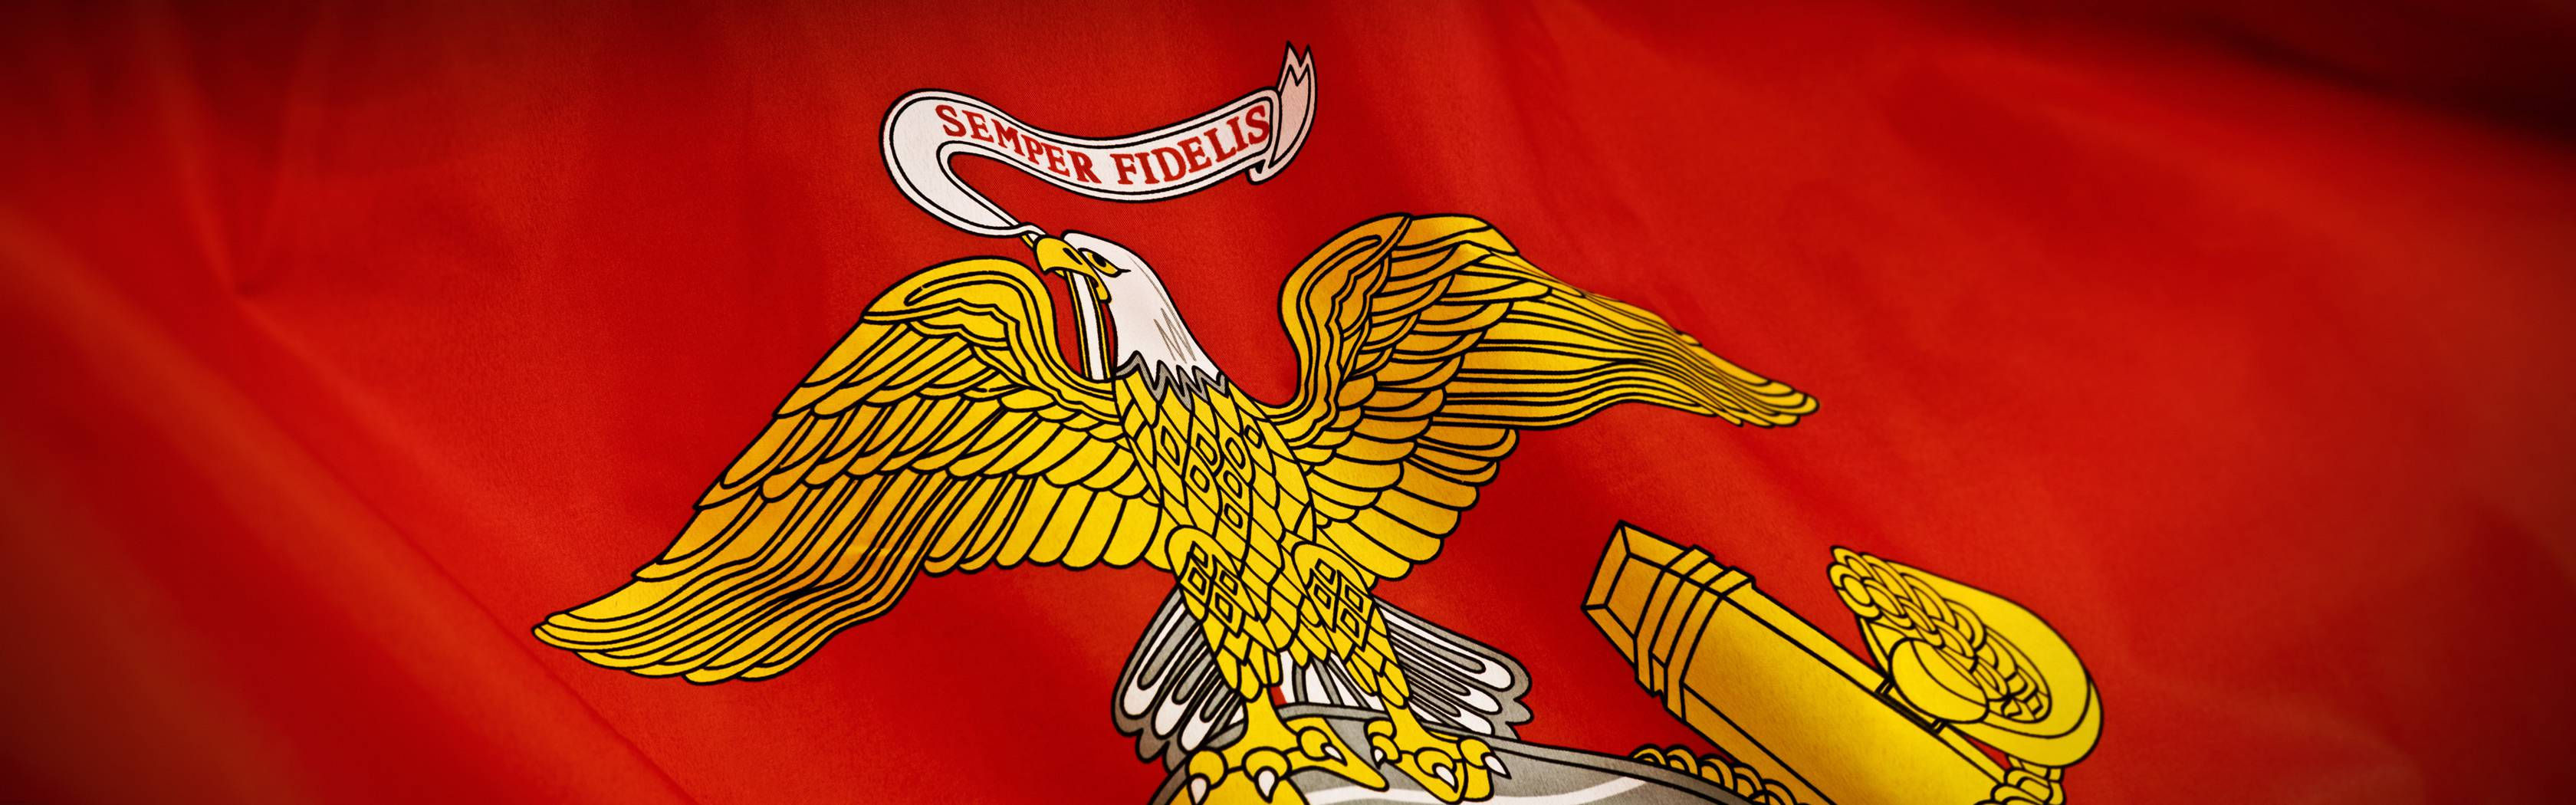 USMC Flag Wallpapers - Top Free USMC